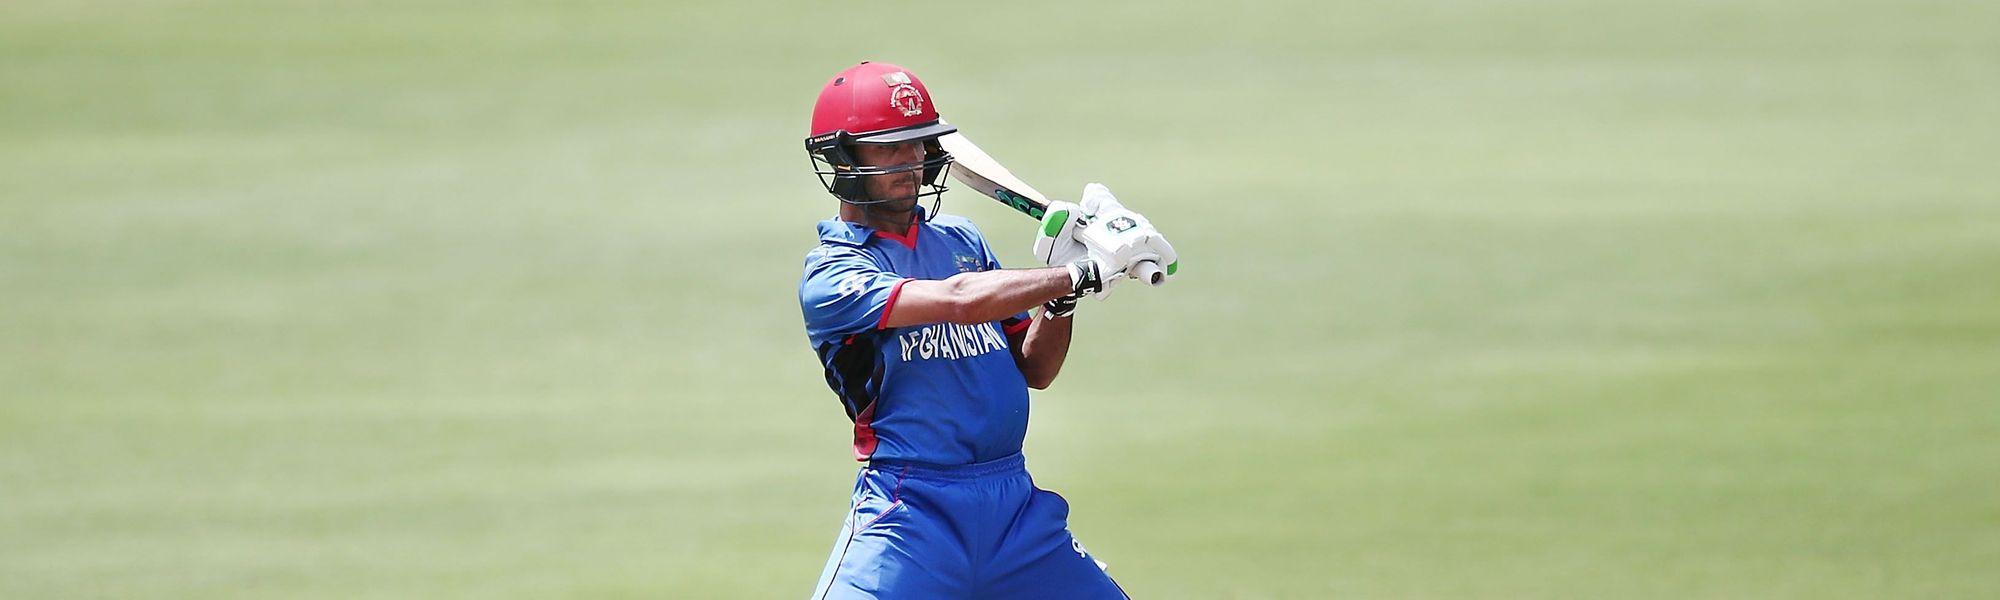 Ikram Ali Khil has proven himself a capable top order batsman